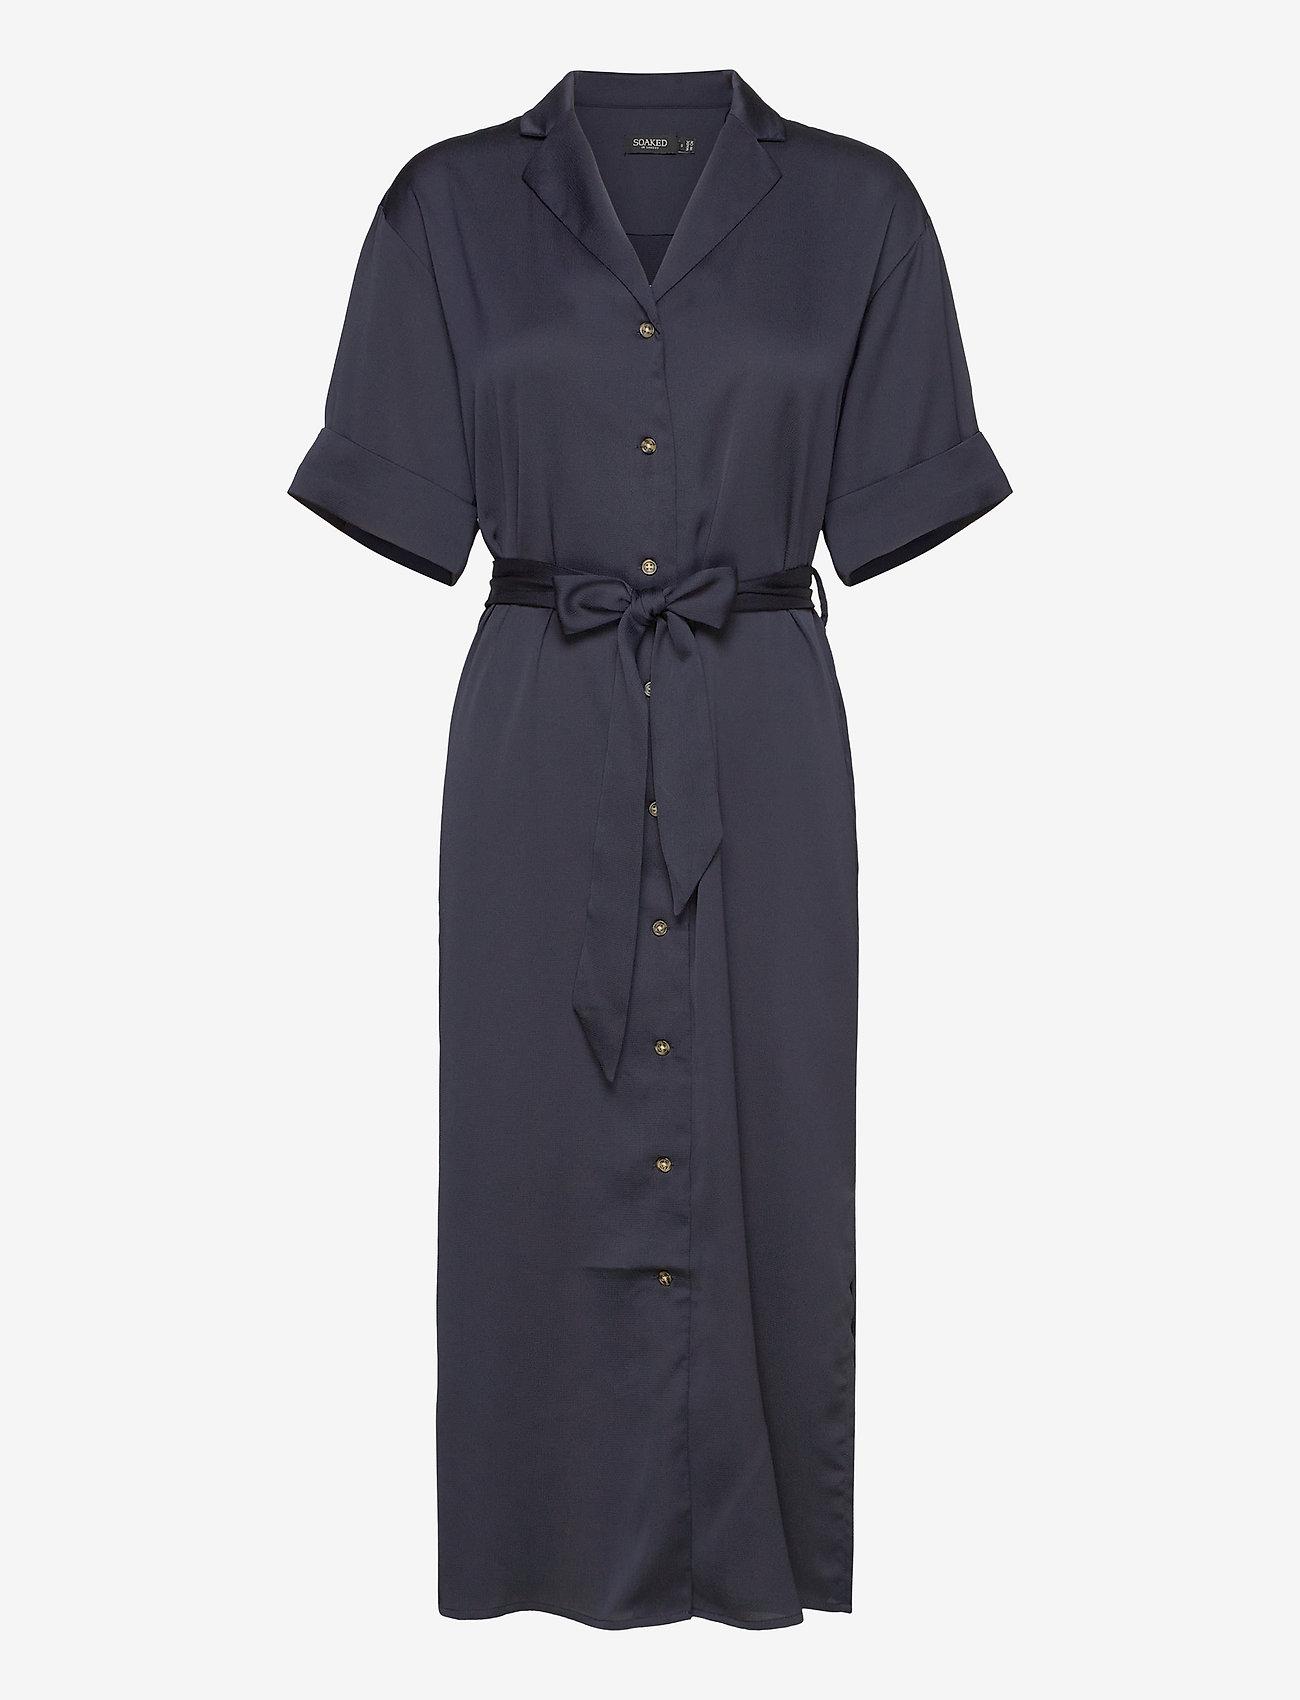 Slveria Dress Ss (Night Sky) - Soaked in Luxury 56zAqi